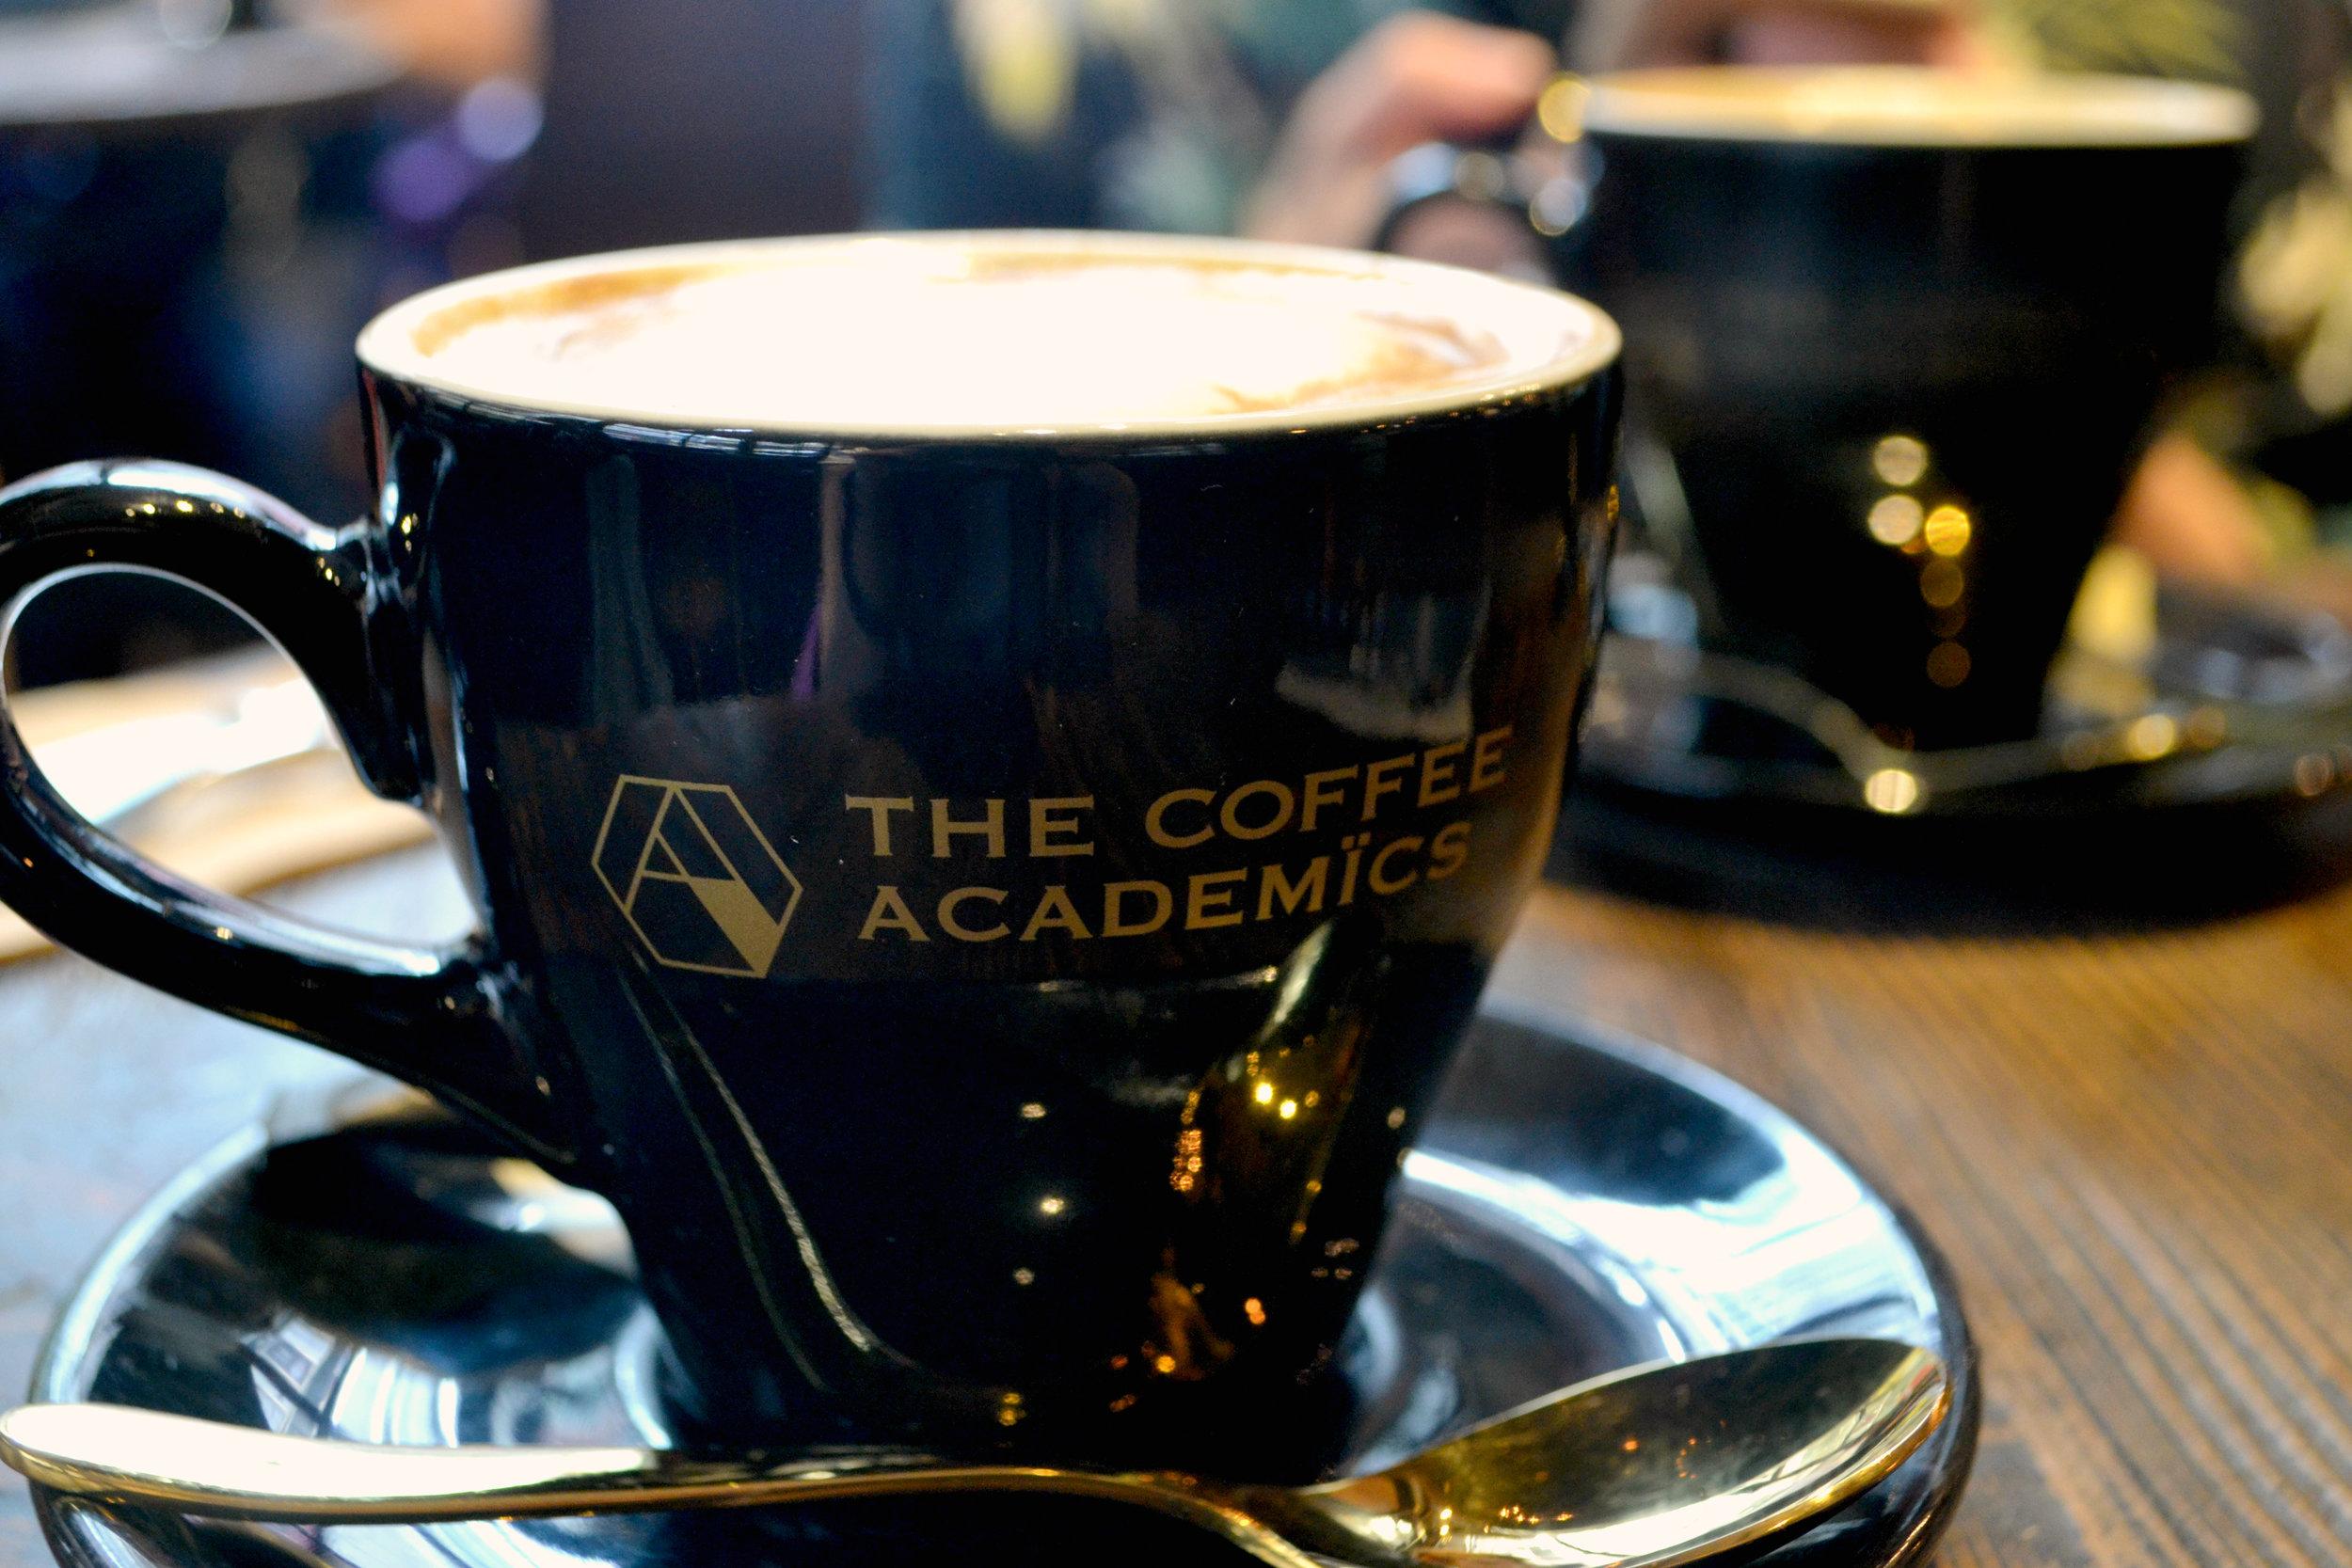 Coffee academics 2.jpg